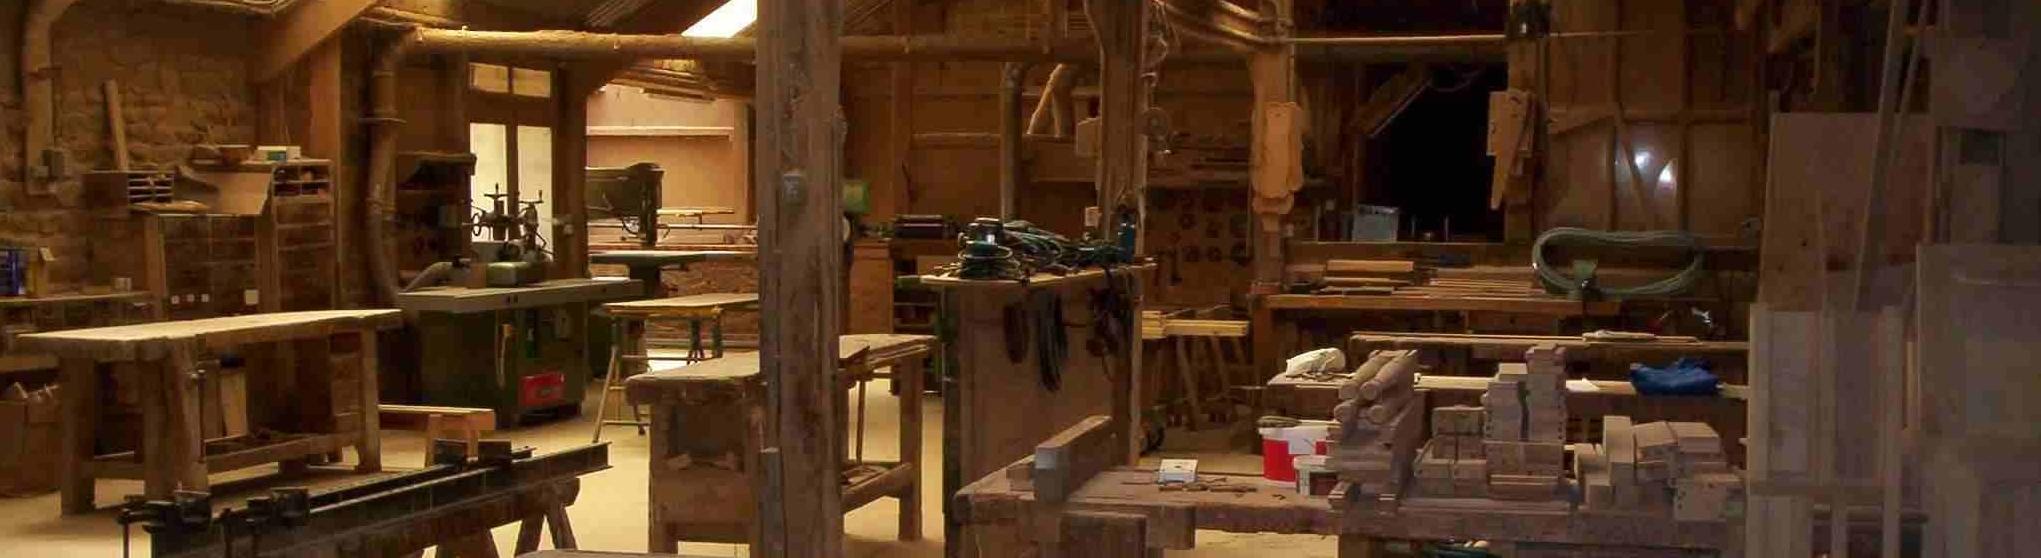 Meubles jean luc prioul fabrique artisanal de meubles for Meuble artisanal